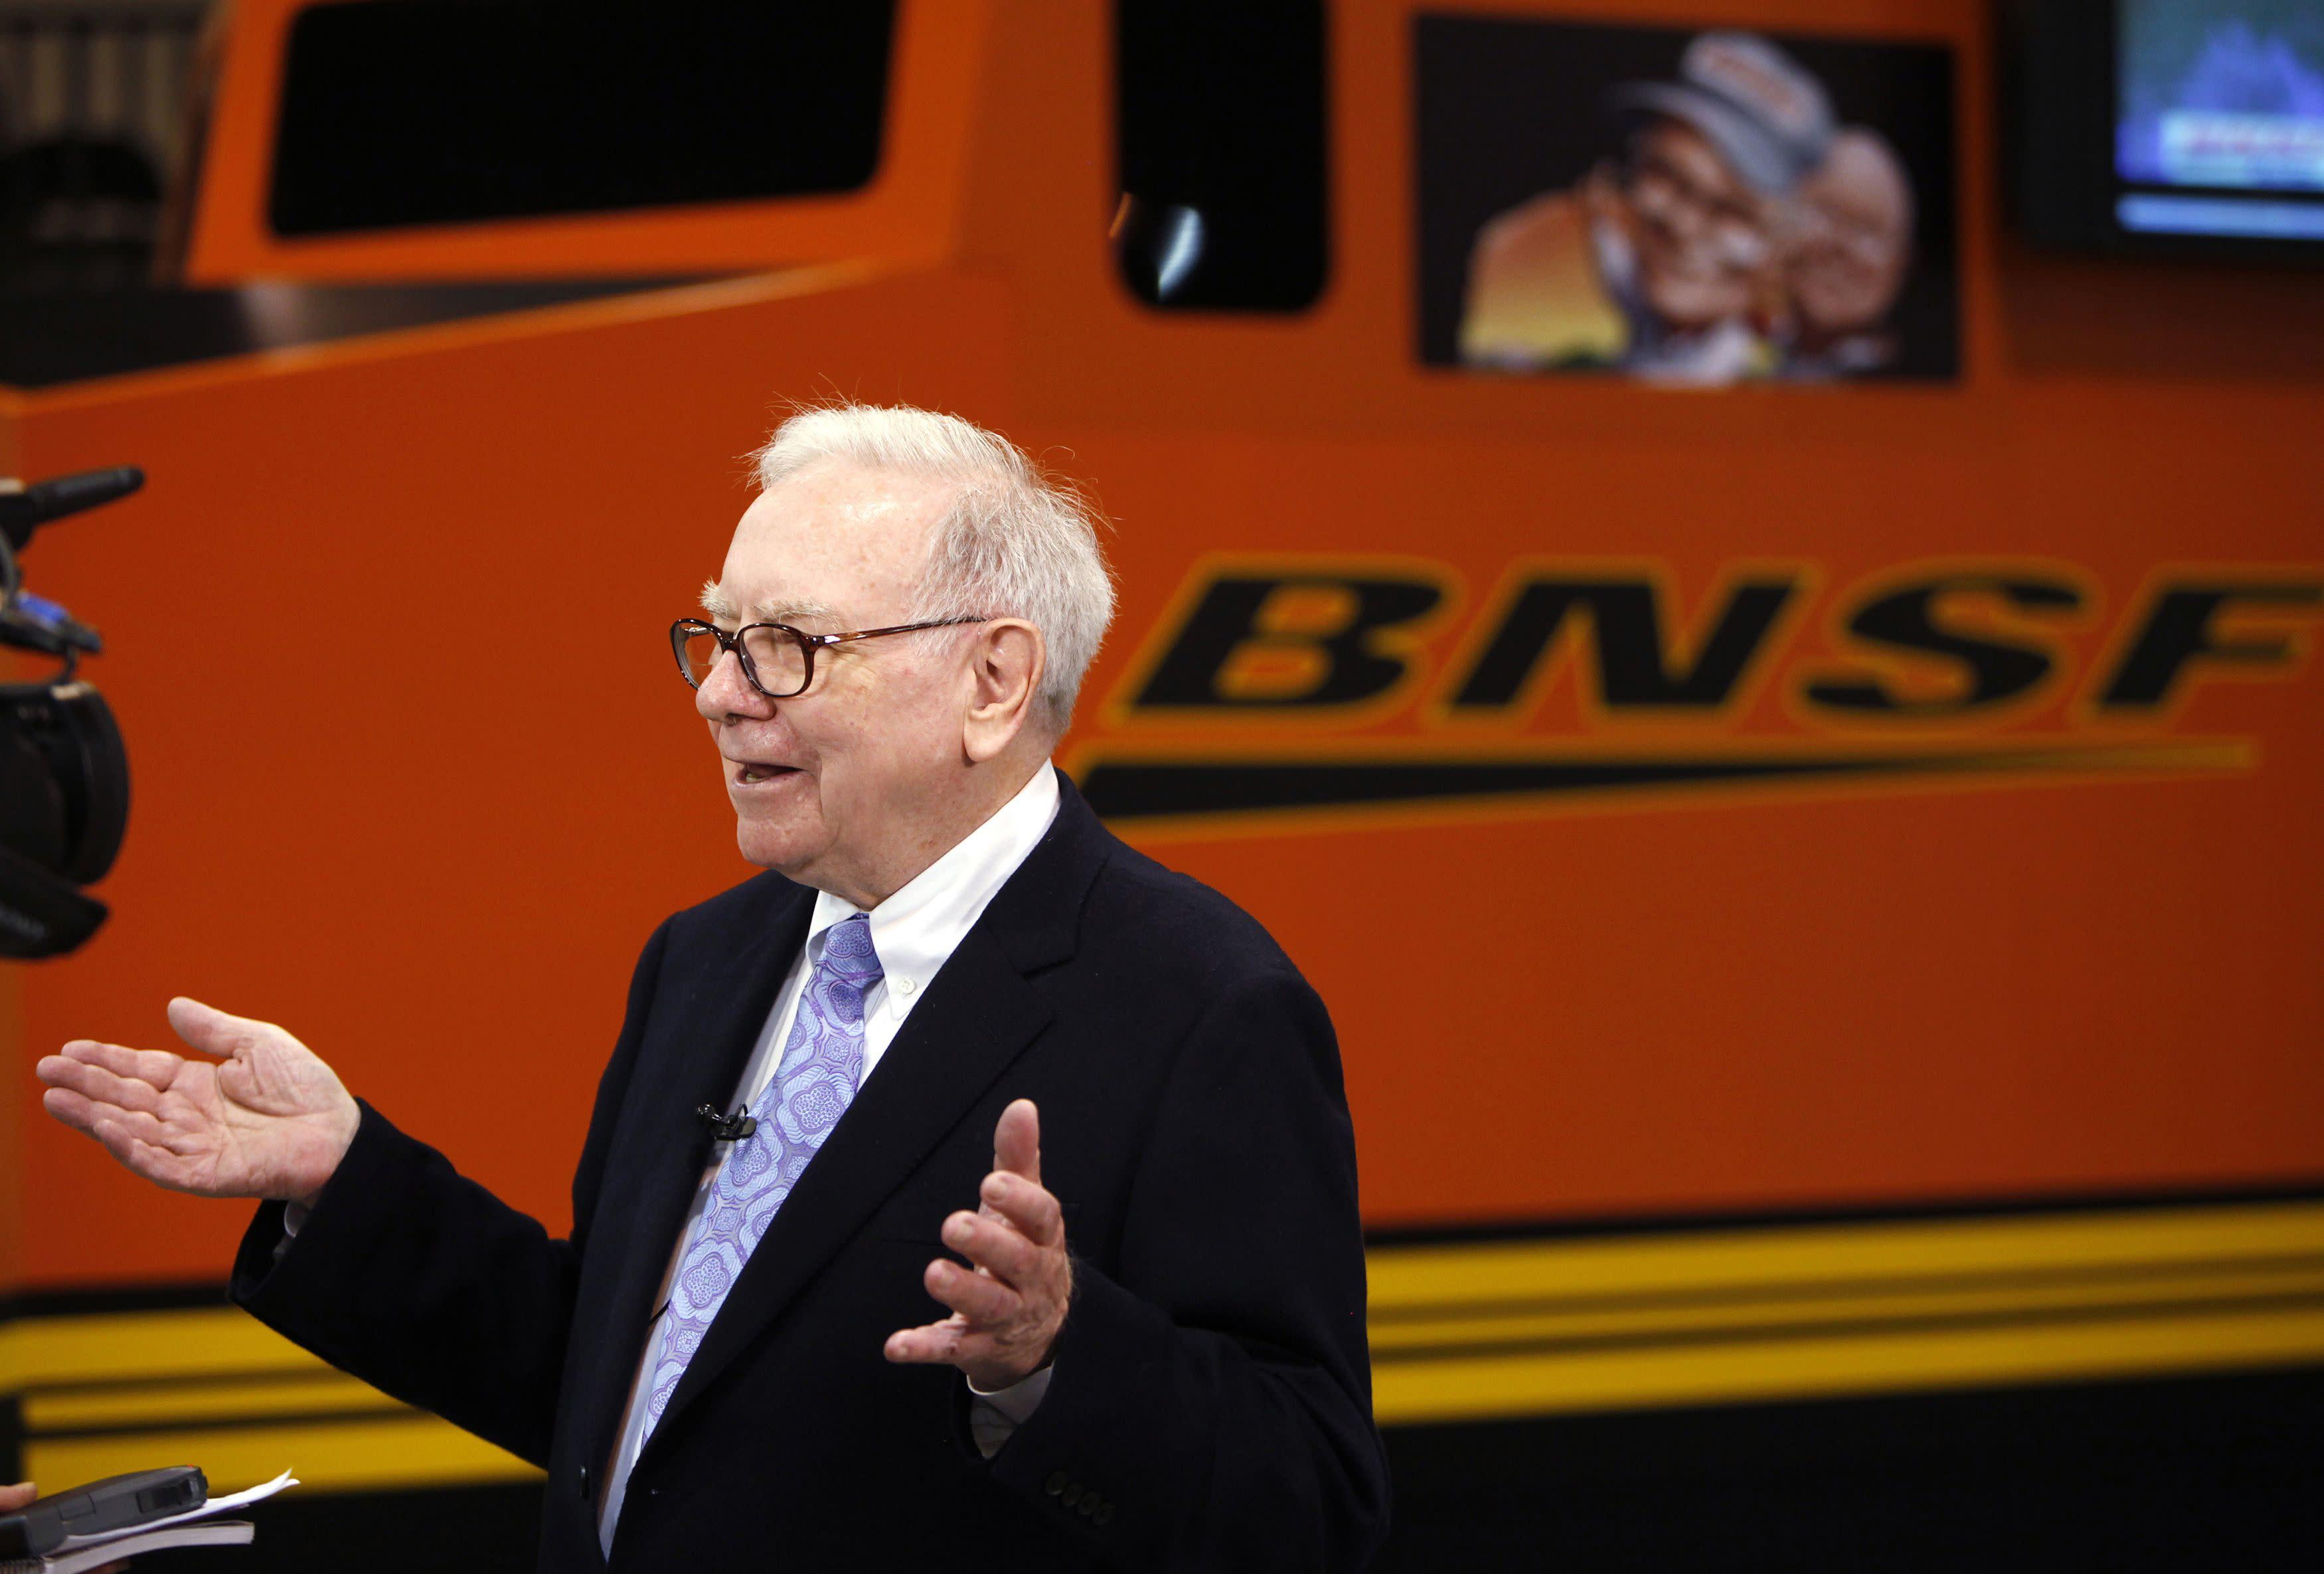 Berkshire Hathaway Chairman Warren Buffett talks in front of a mock BNSF railroad engine. REUTERS/Rick Wilking